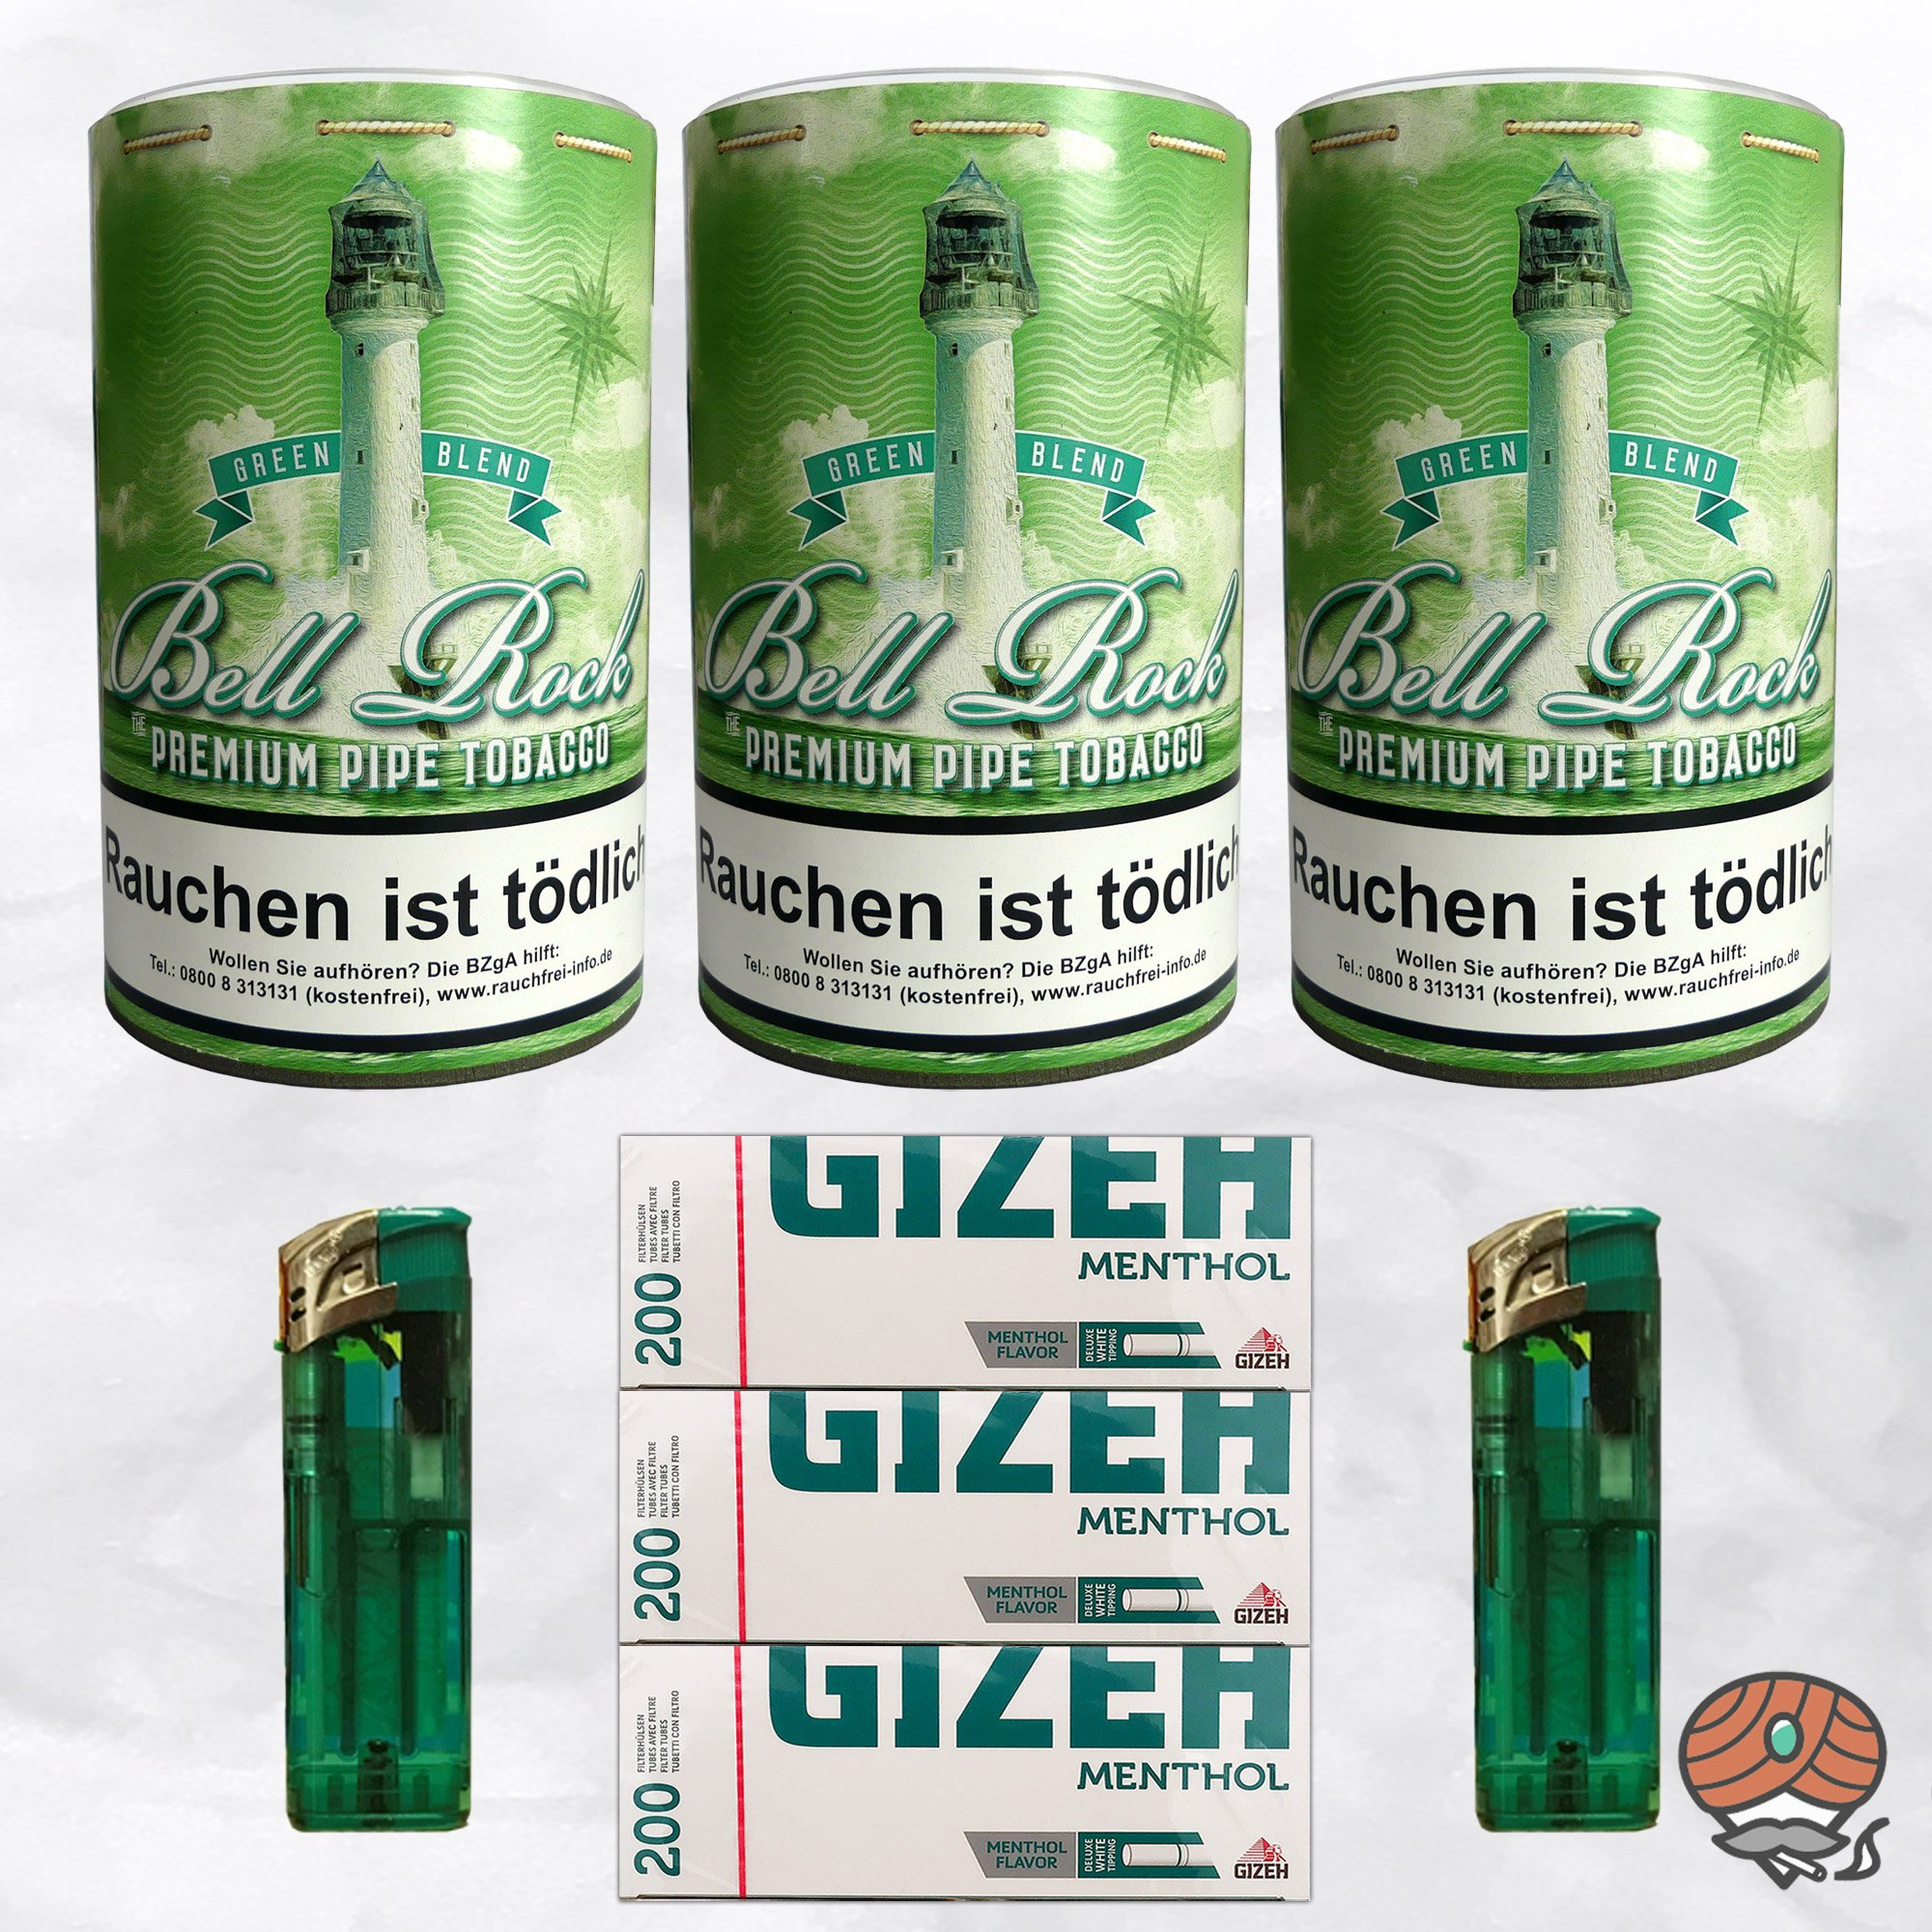 3 x Bell Rock Green Blend Menthol Pfeifentabak 160g Dose + 600 Menthol-Hülsen